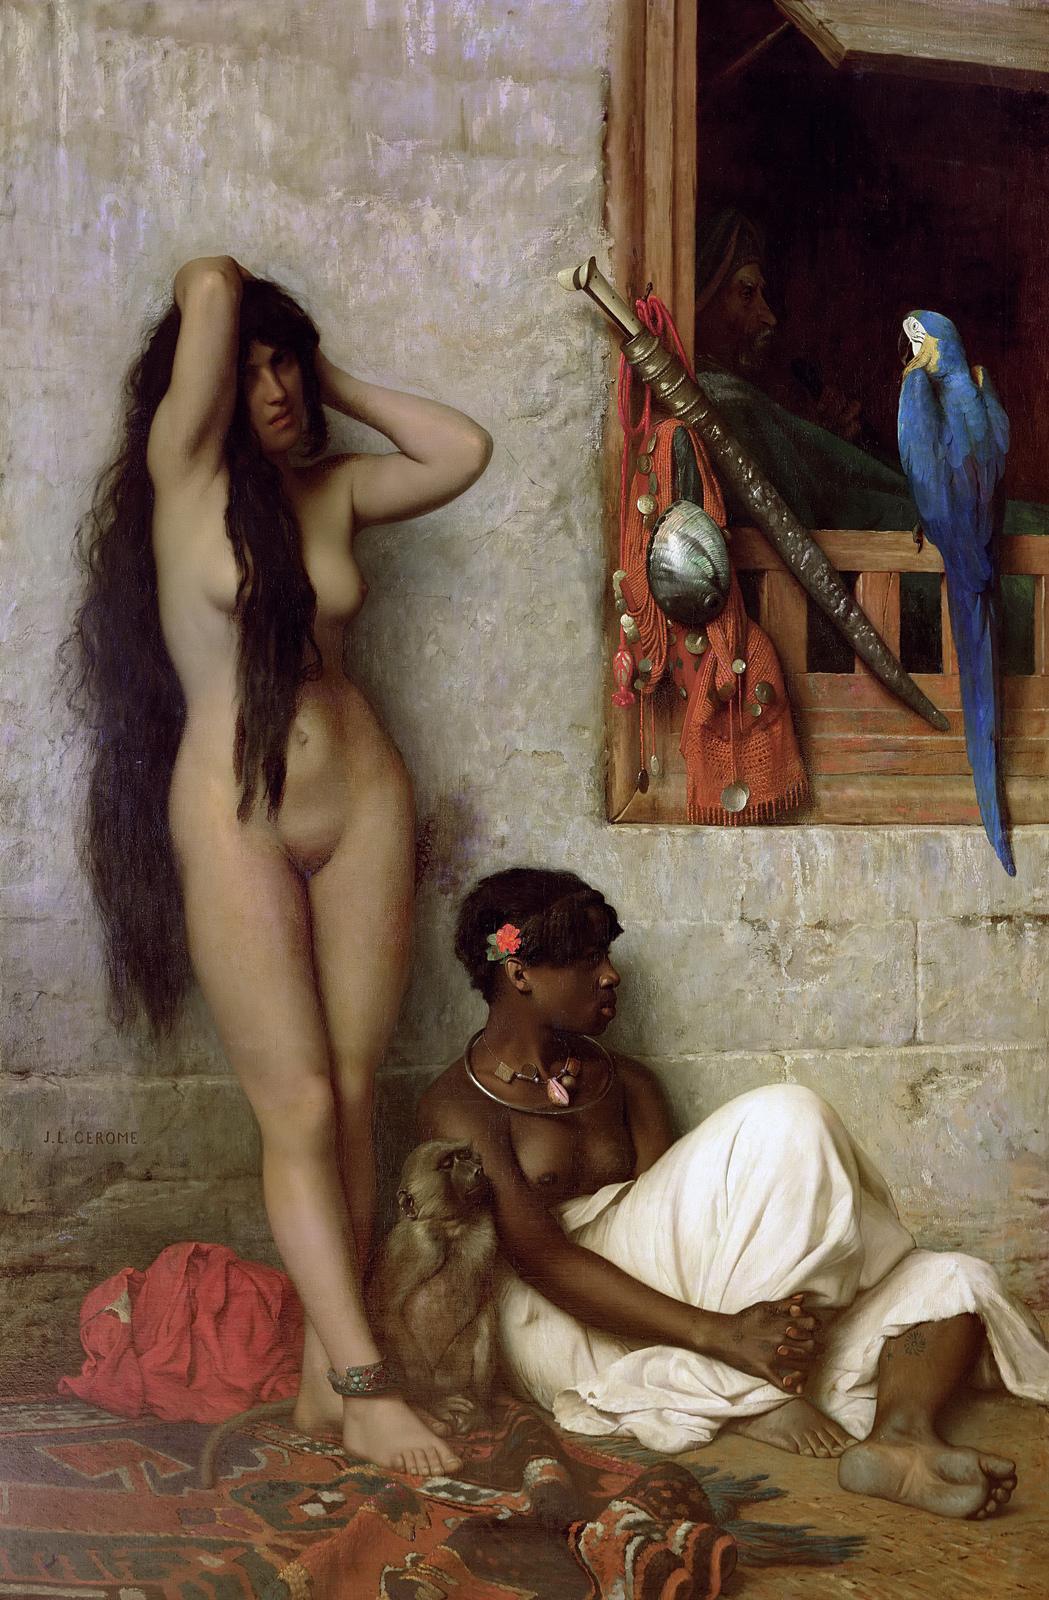 Jean-Leon Gerome - Slave For Sale, 1873